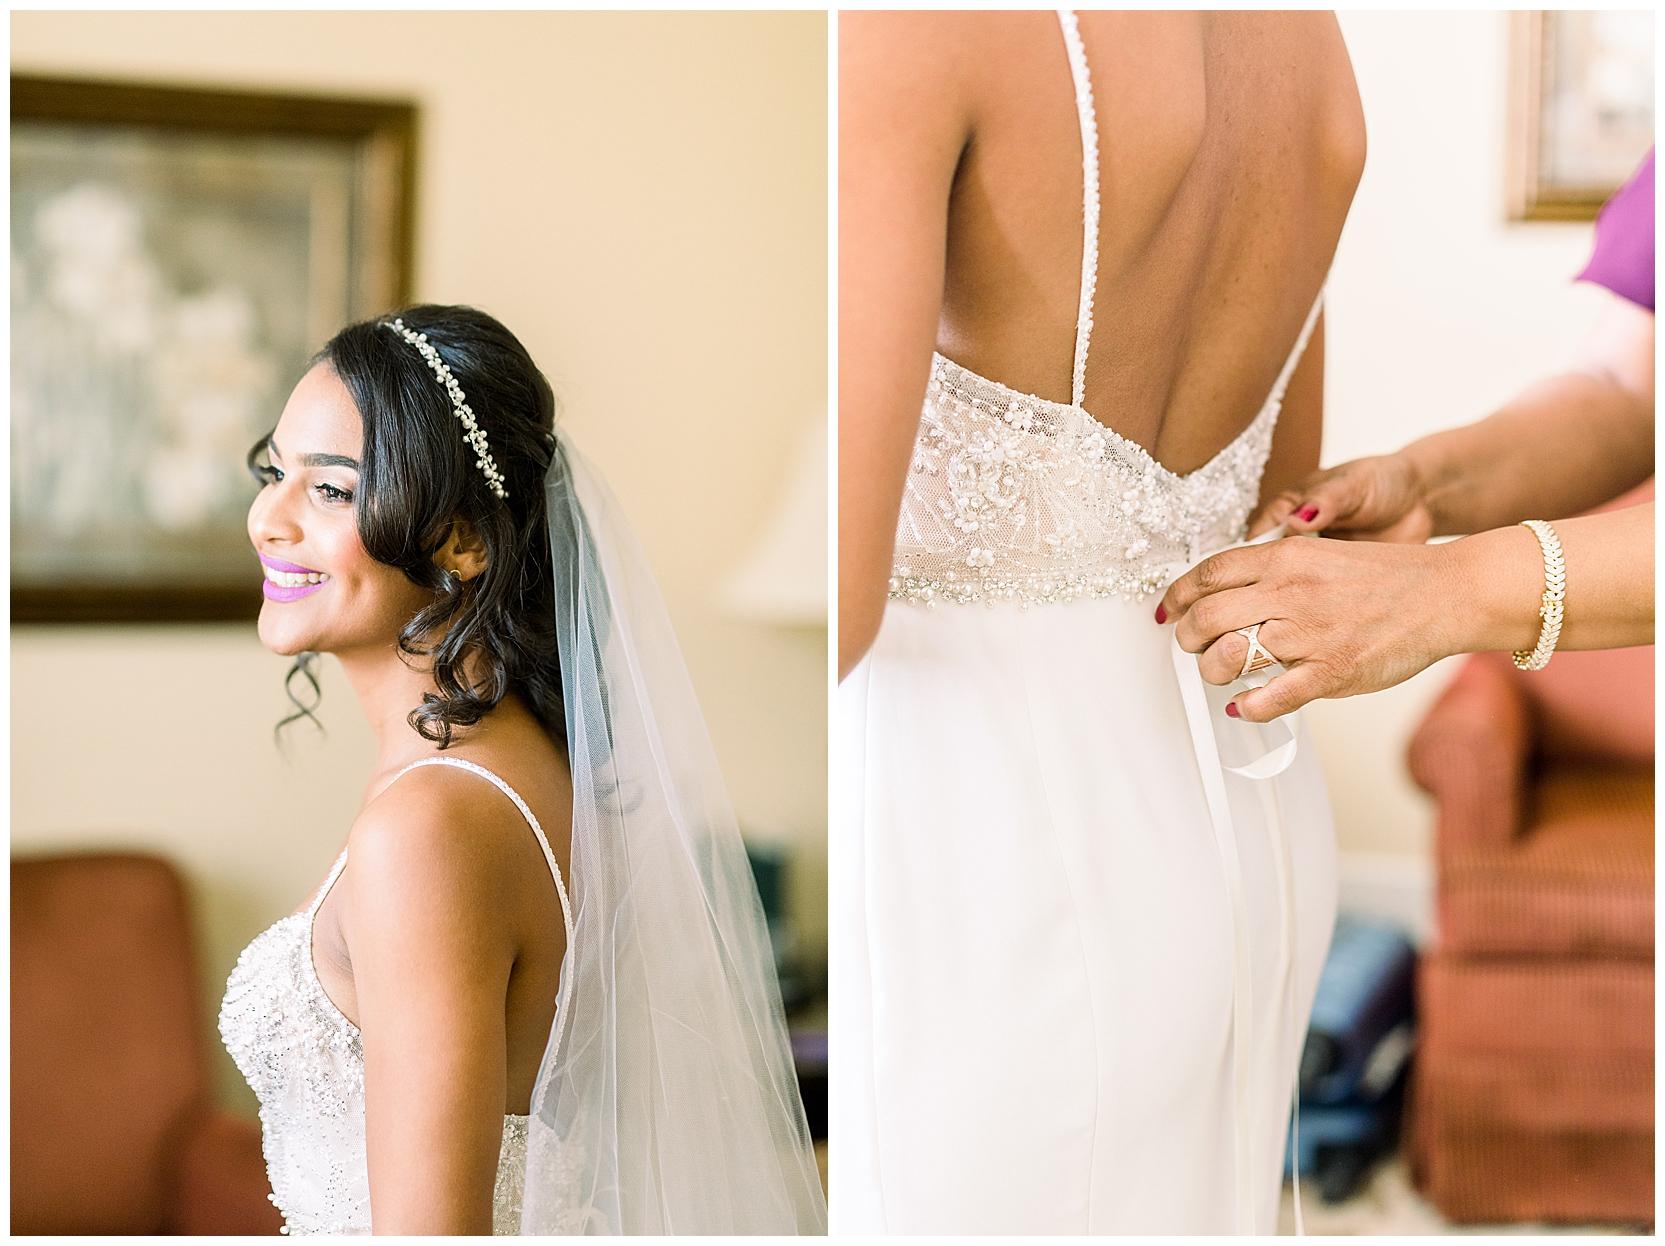 jessicafredericks_lakeland_tampa_wedding_purple_crazy hour_0009.jpg